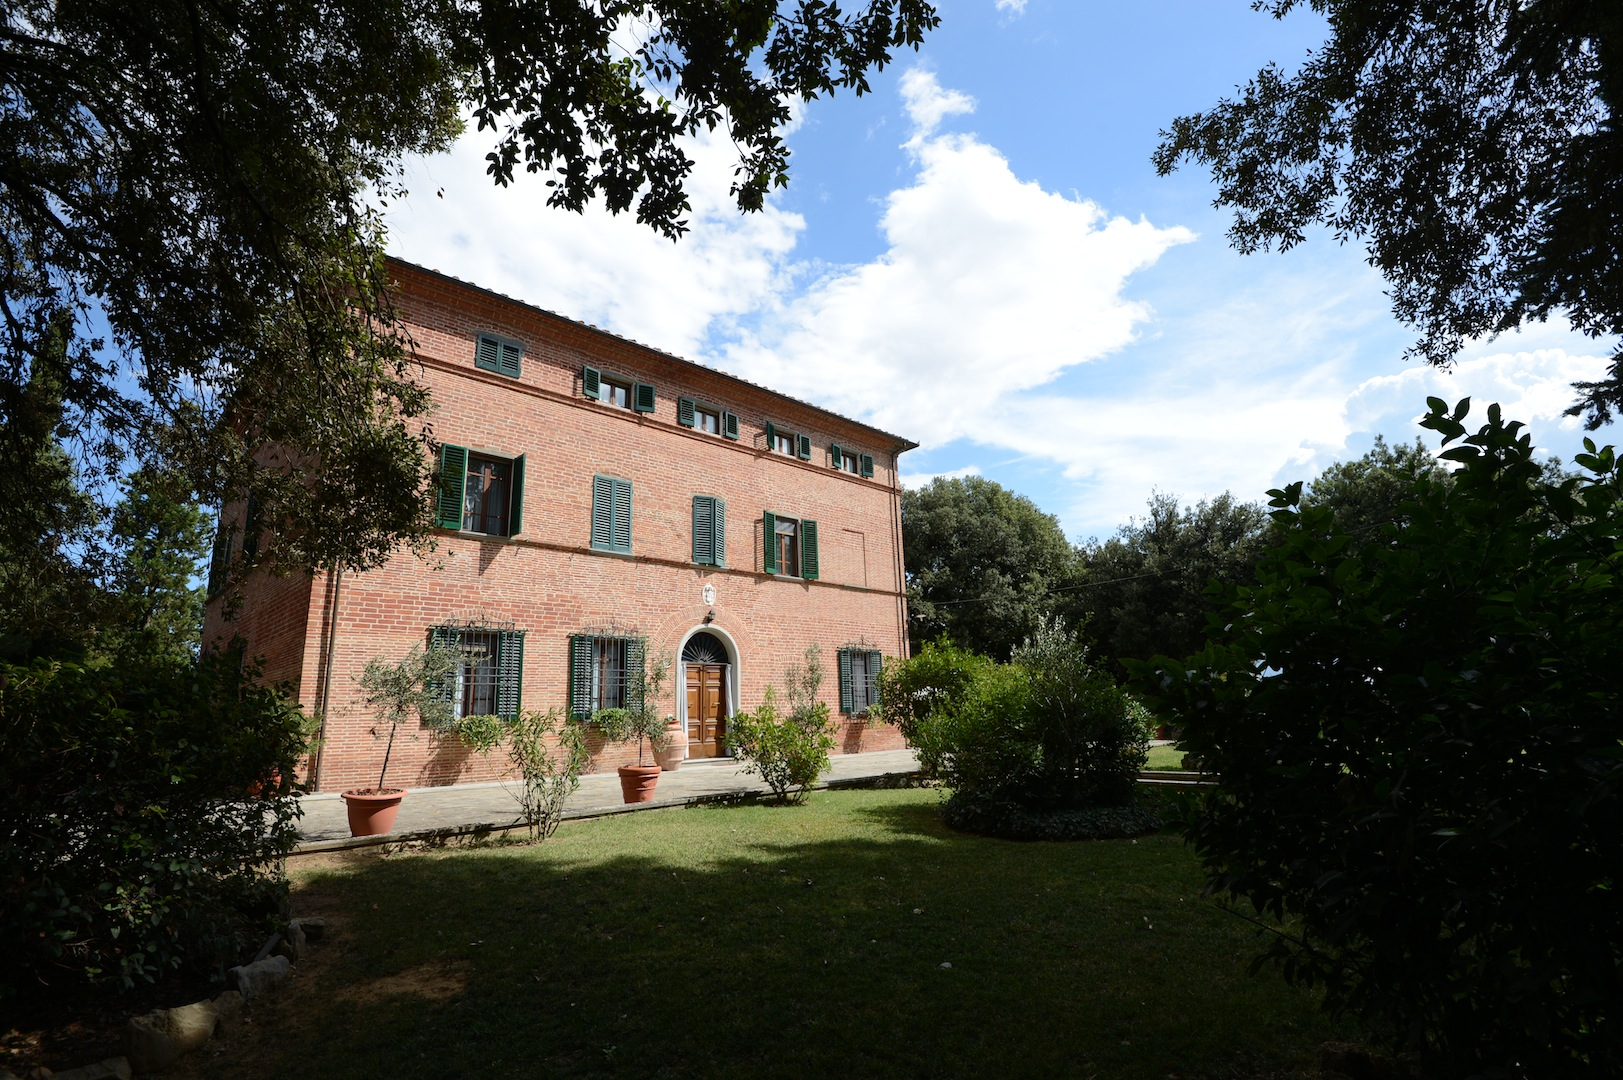 Villa toscana in vendita arezzo toscana italia for Villas toscana